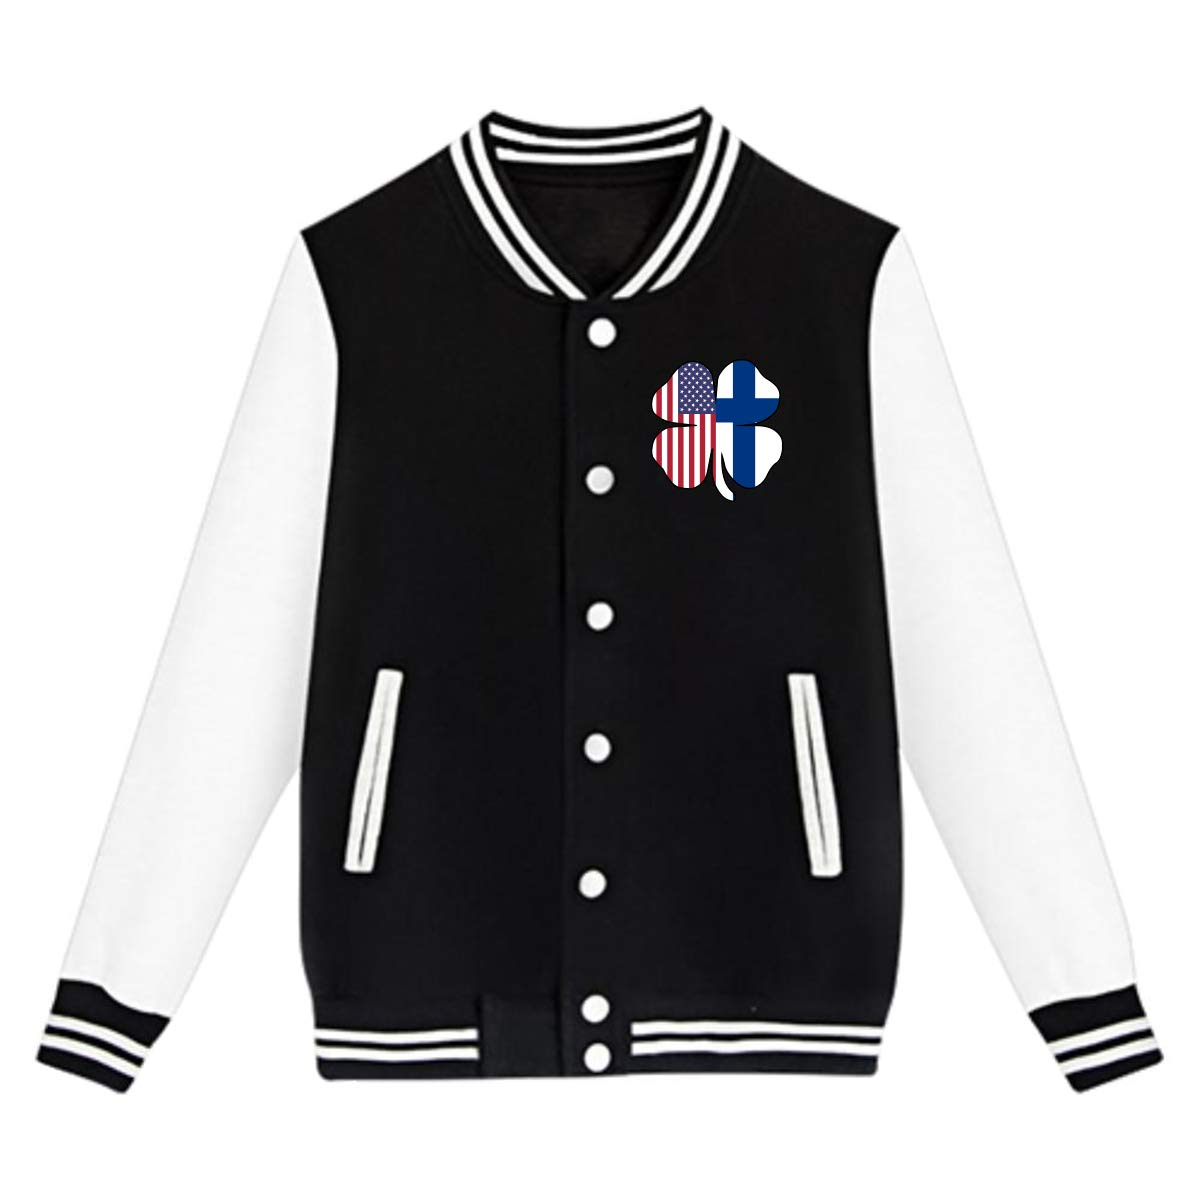 American Finland Flag Shamrock Coat Sweatshirt Outwear NJKM5MJ Unisex Youth Baseball Uniform Jacket